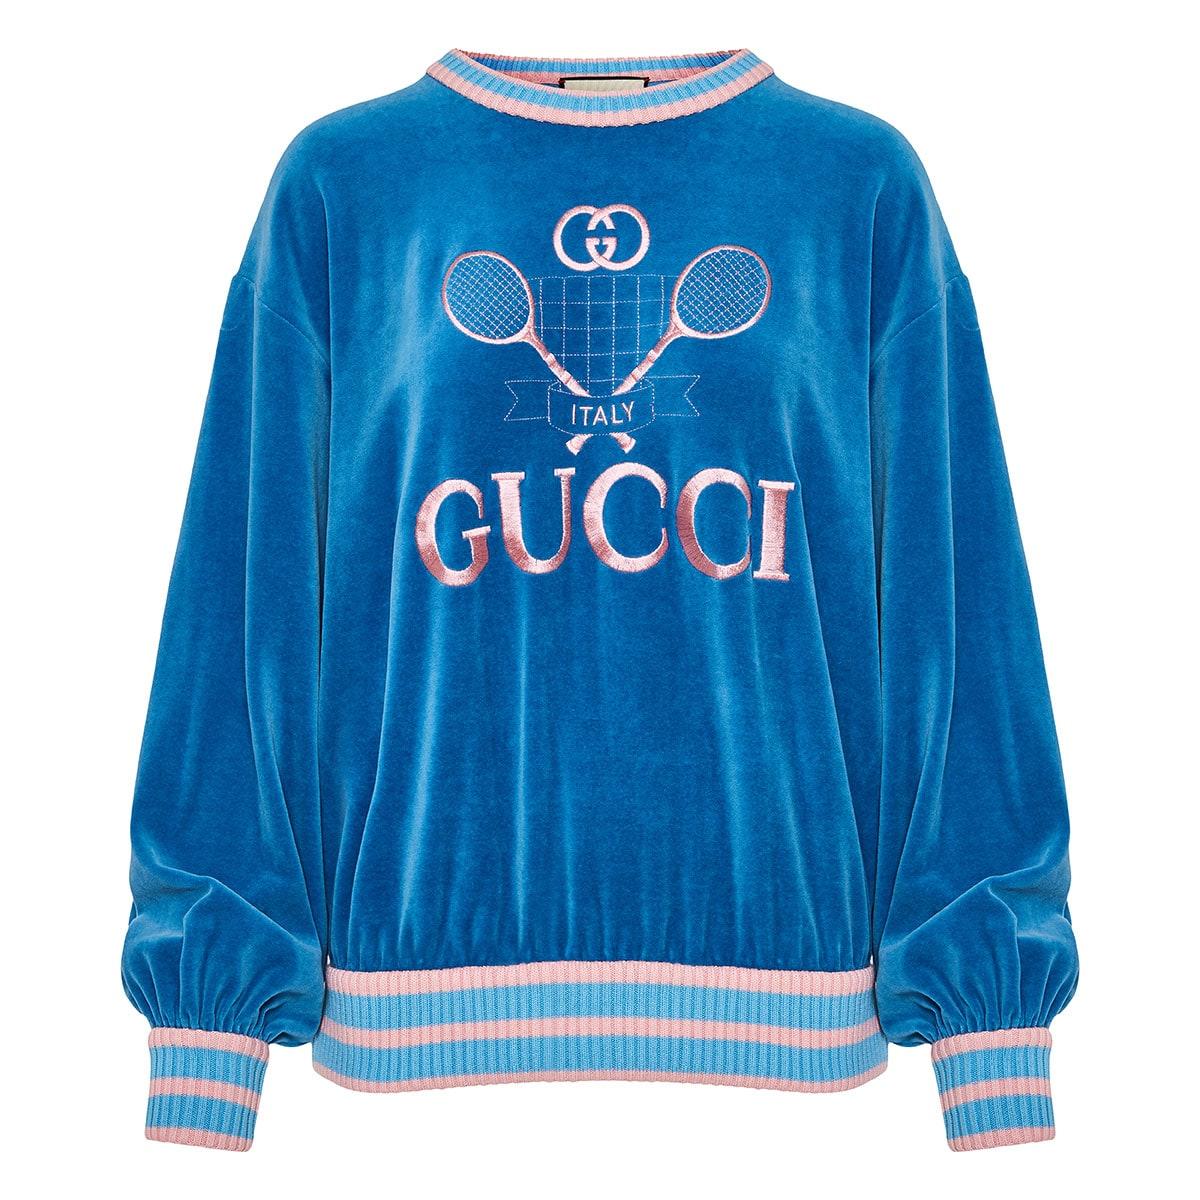 0ba334c41 Oversized Gucci Tennis chenille sweatshirt | LuisaWorld